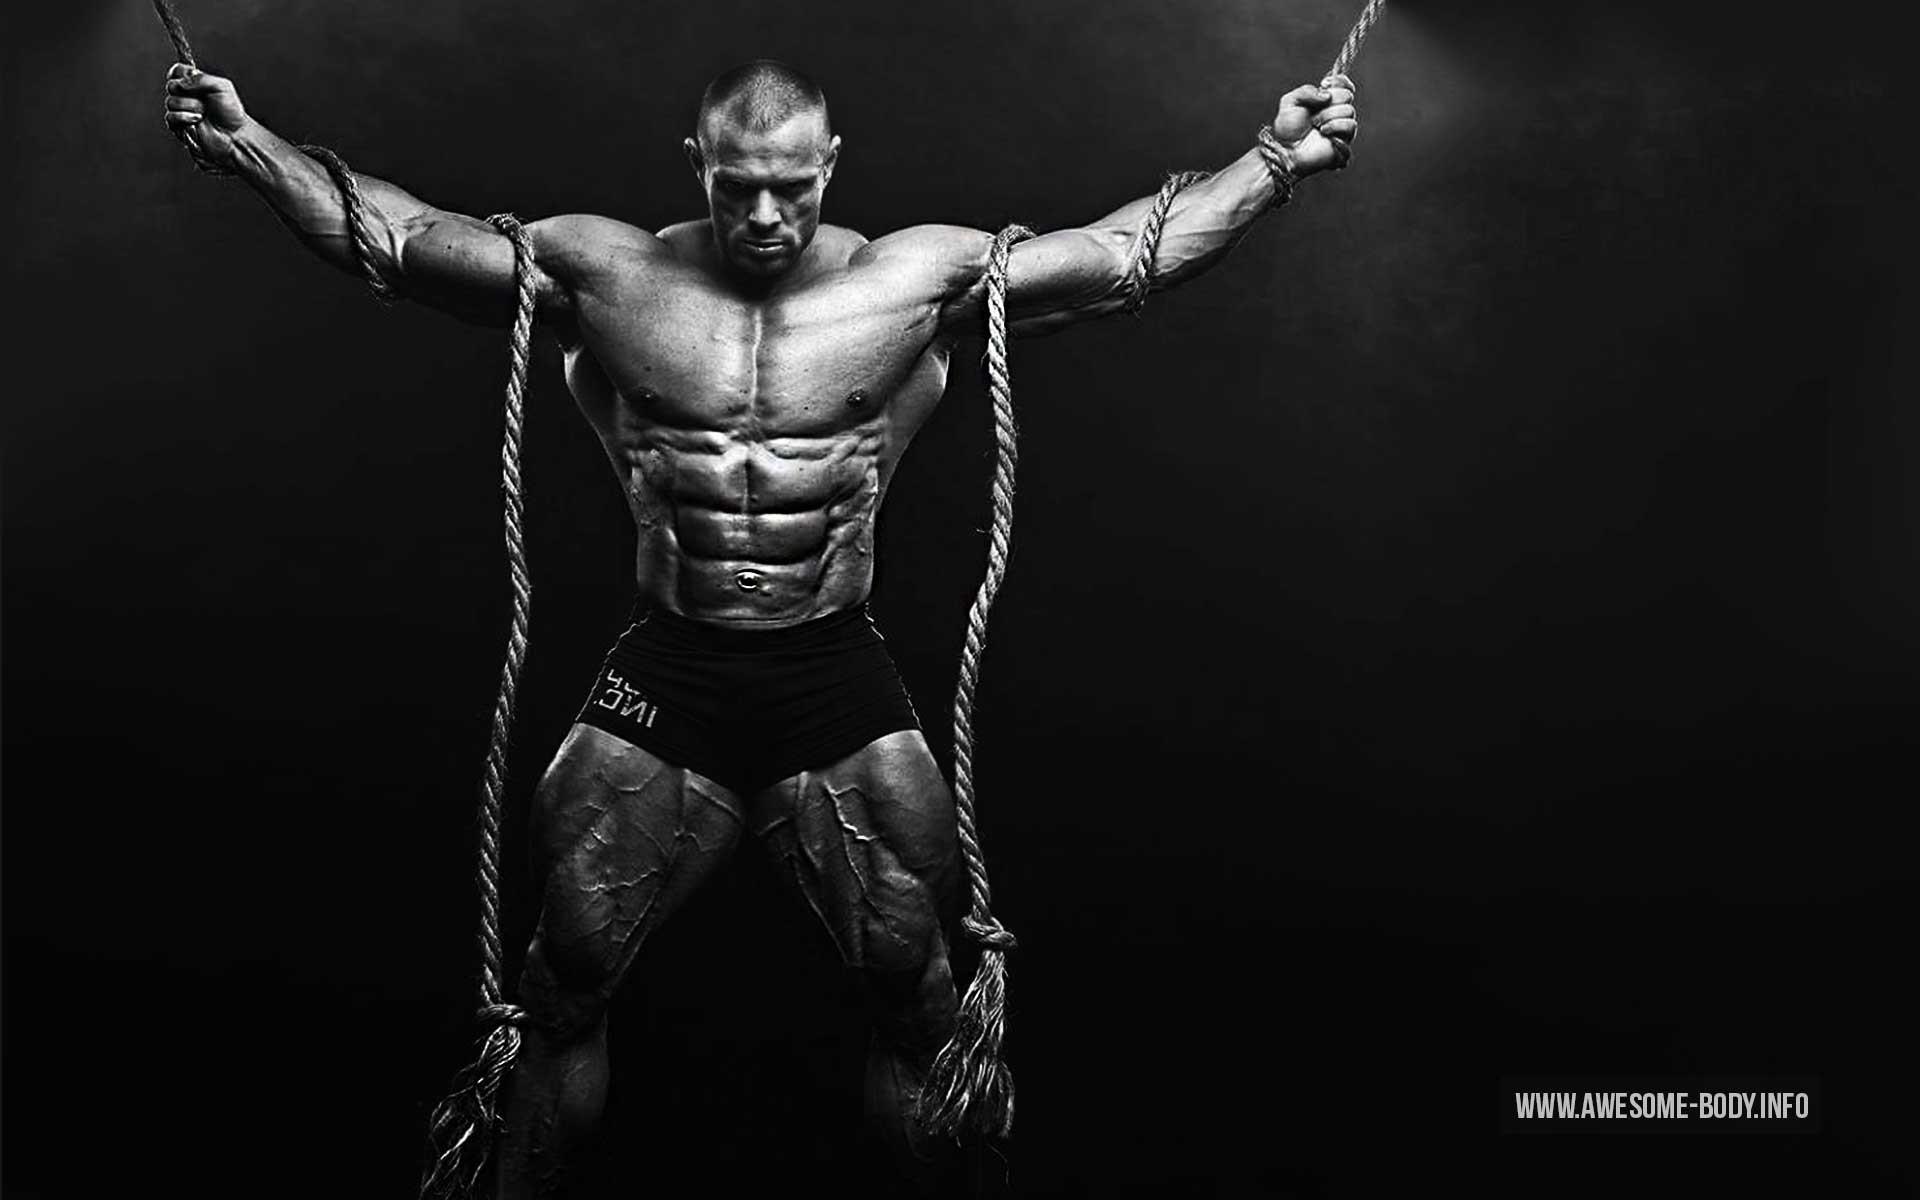 Bodybuilding wallpaper hd 2018 wallpapertag - Fitness wallpapers for desktop ...